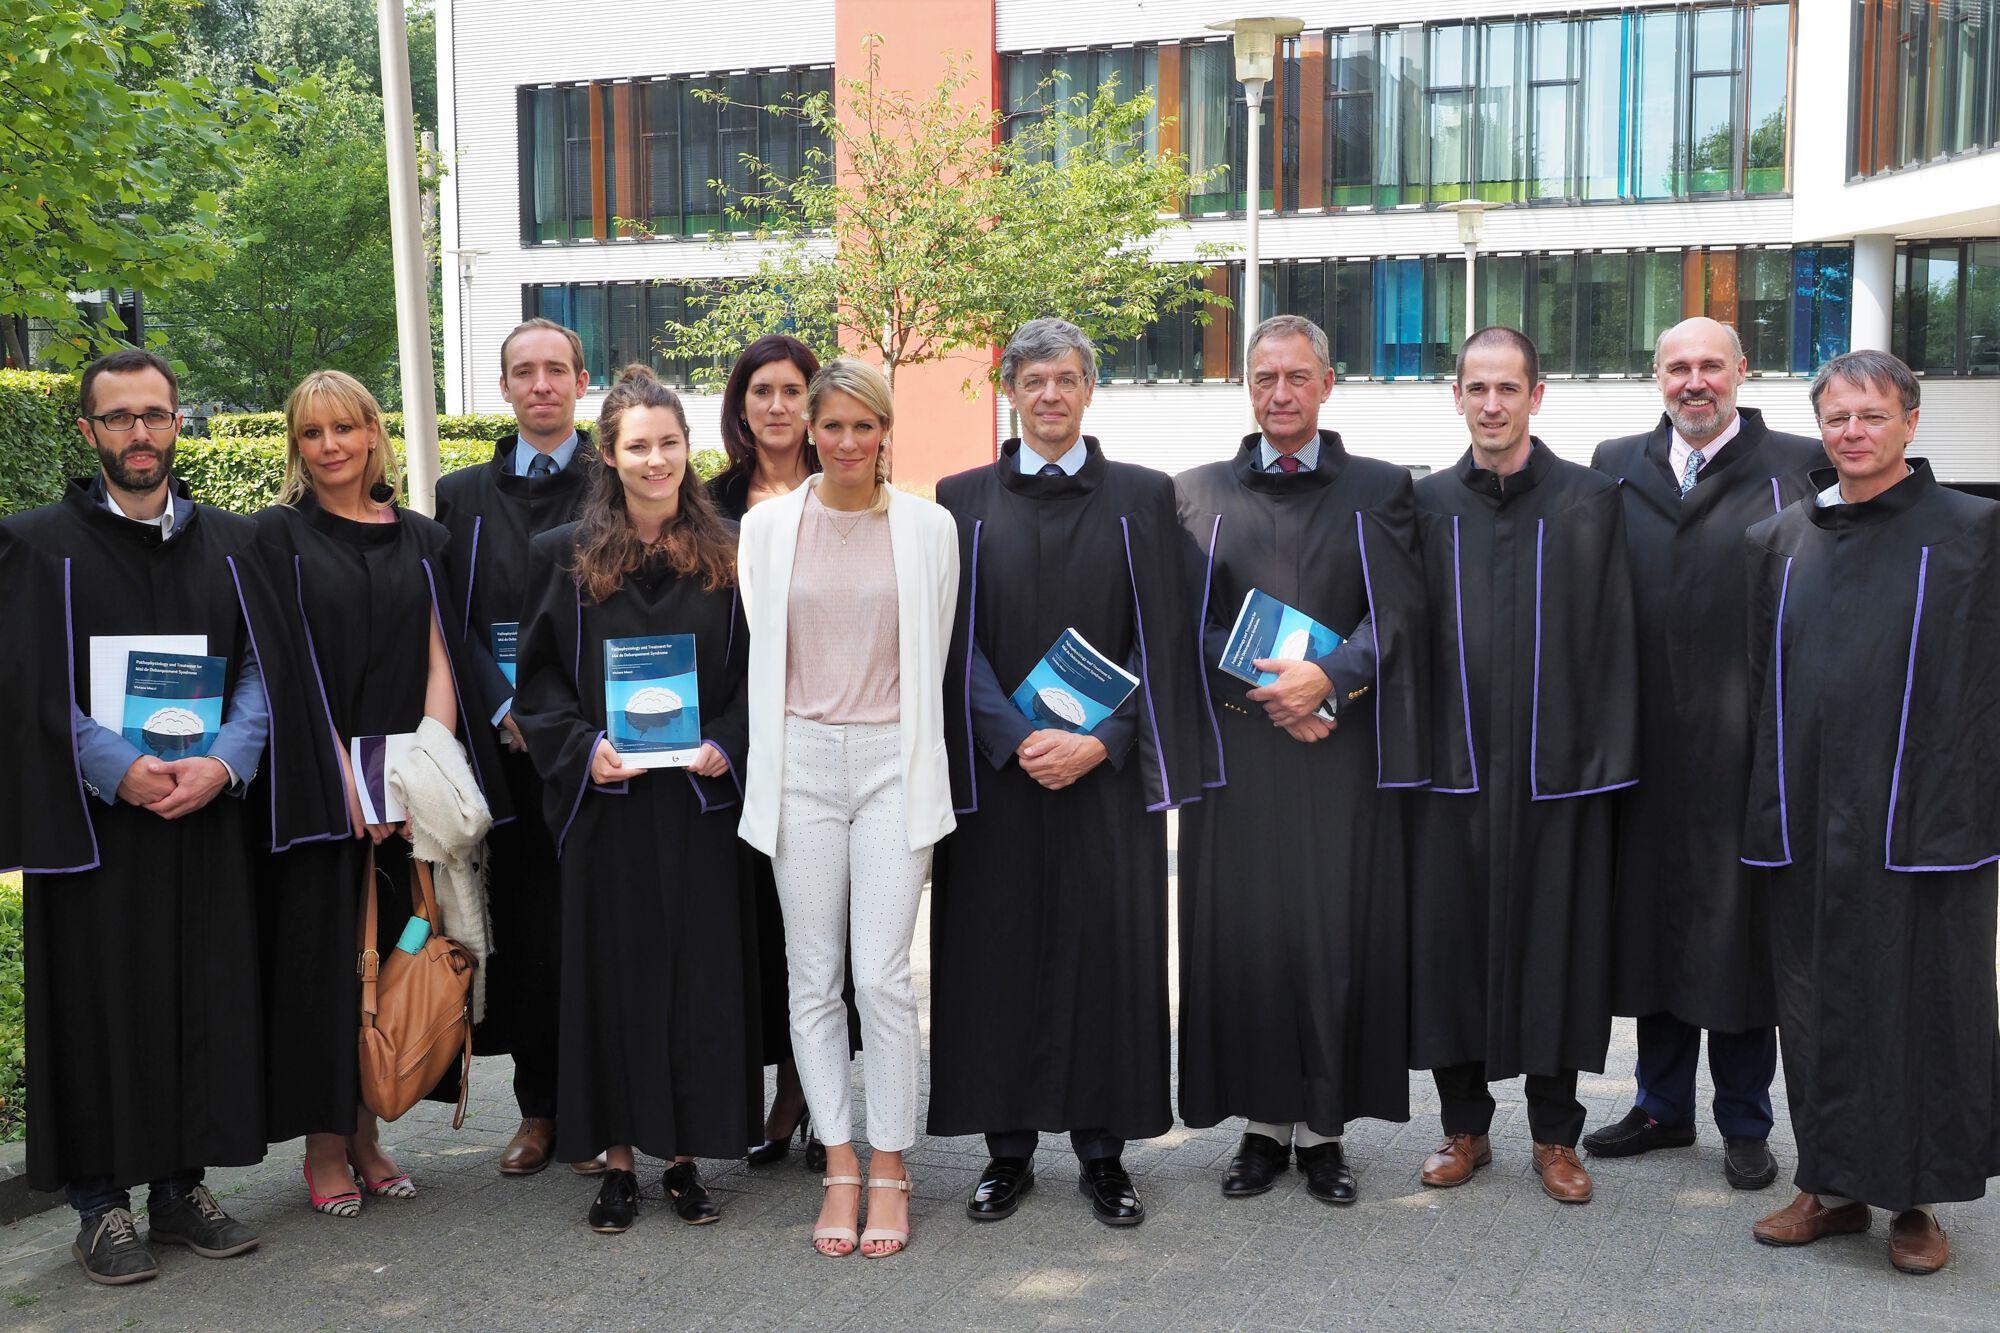 Doctoraatsverdediging Viviana Mucci - 4 juli 2018